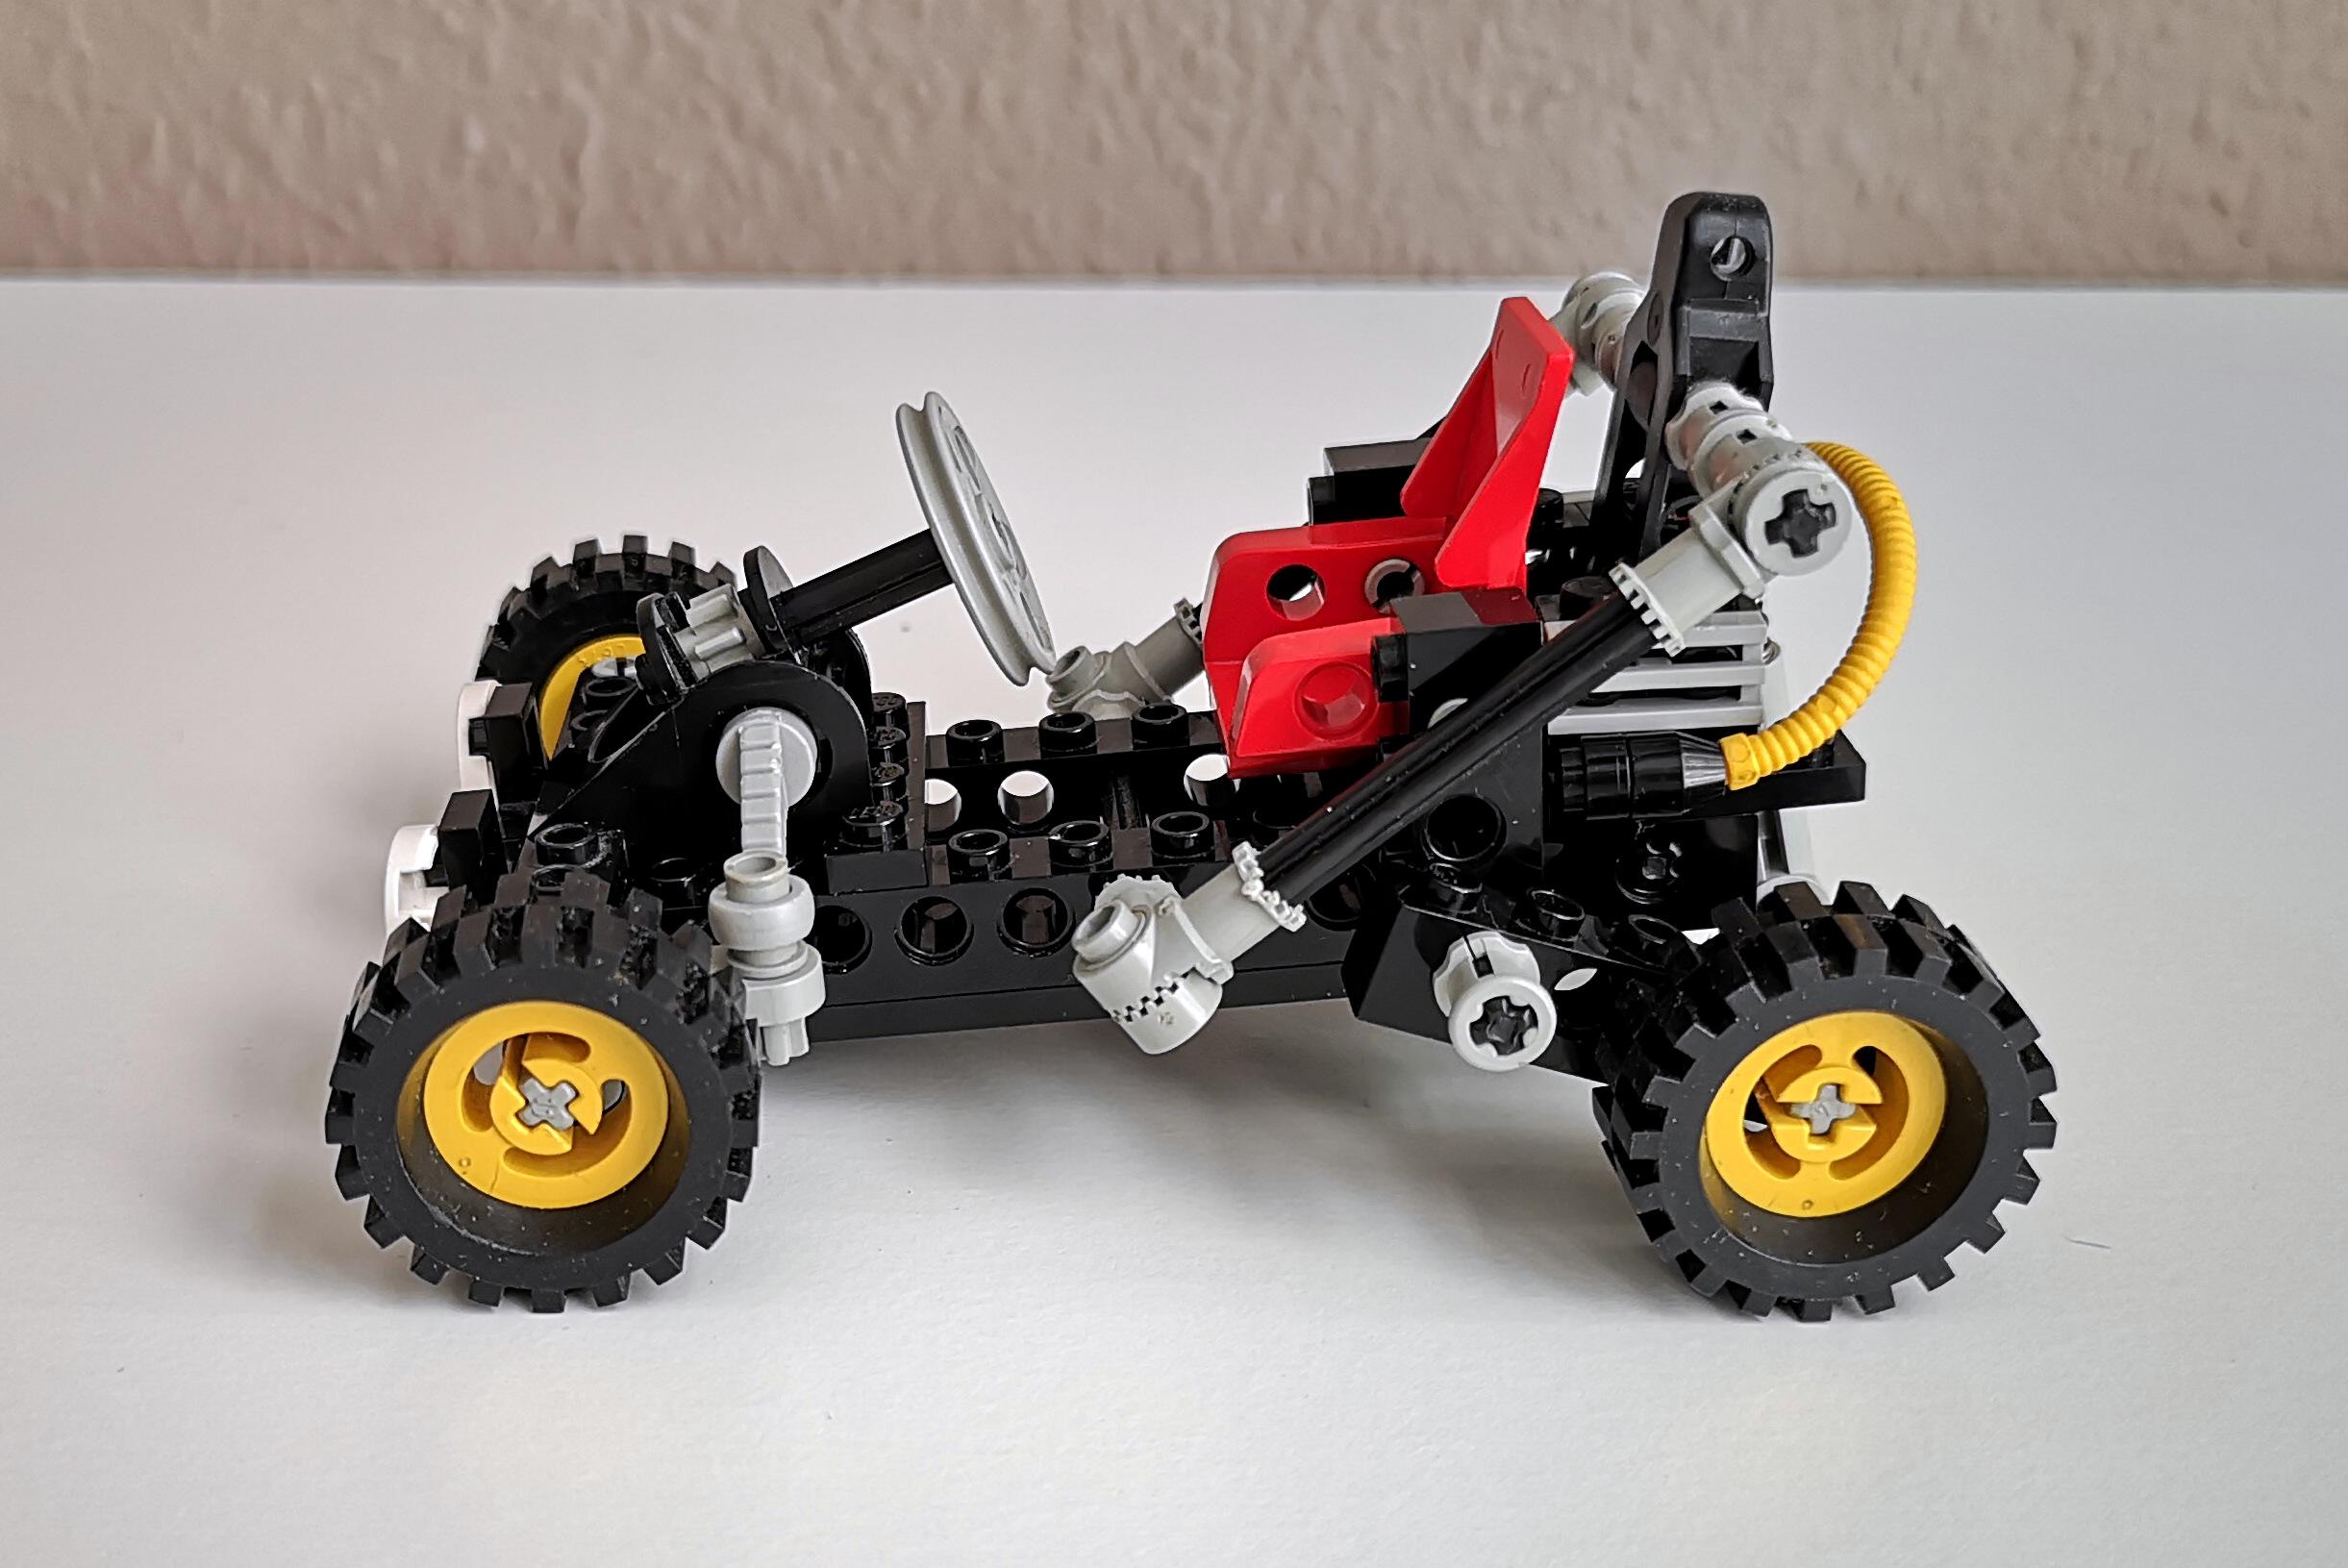 LEGO Set 8832 Modell A Seitenansicht